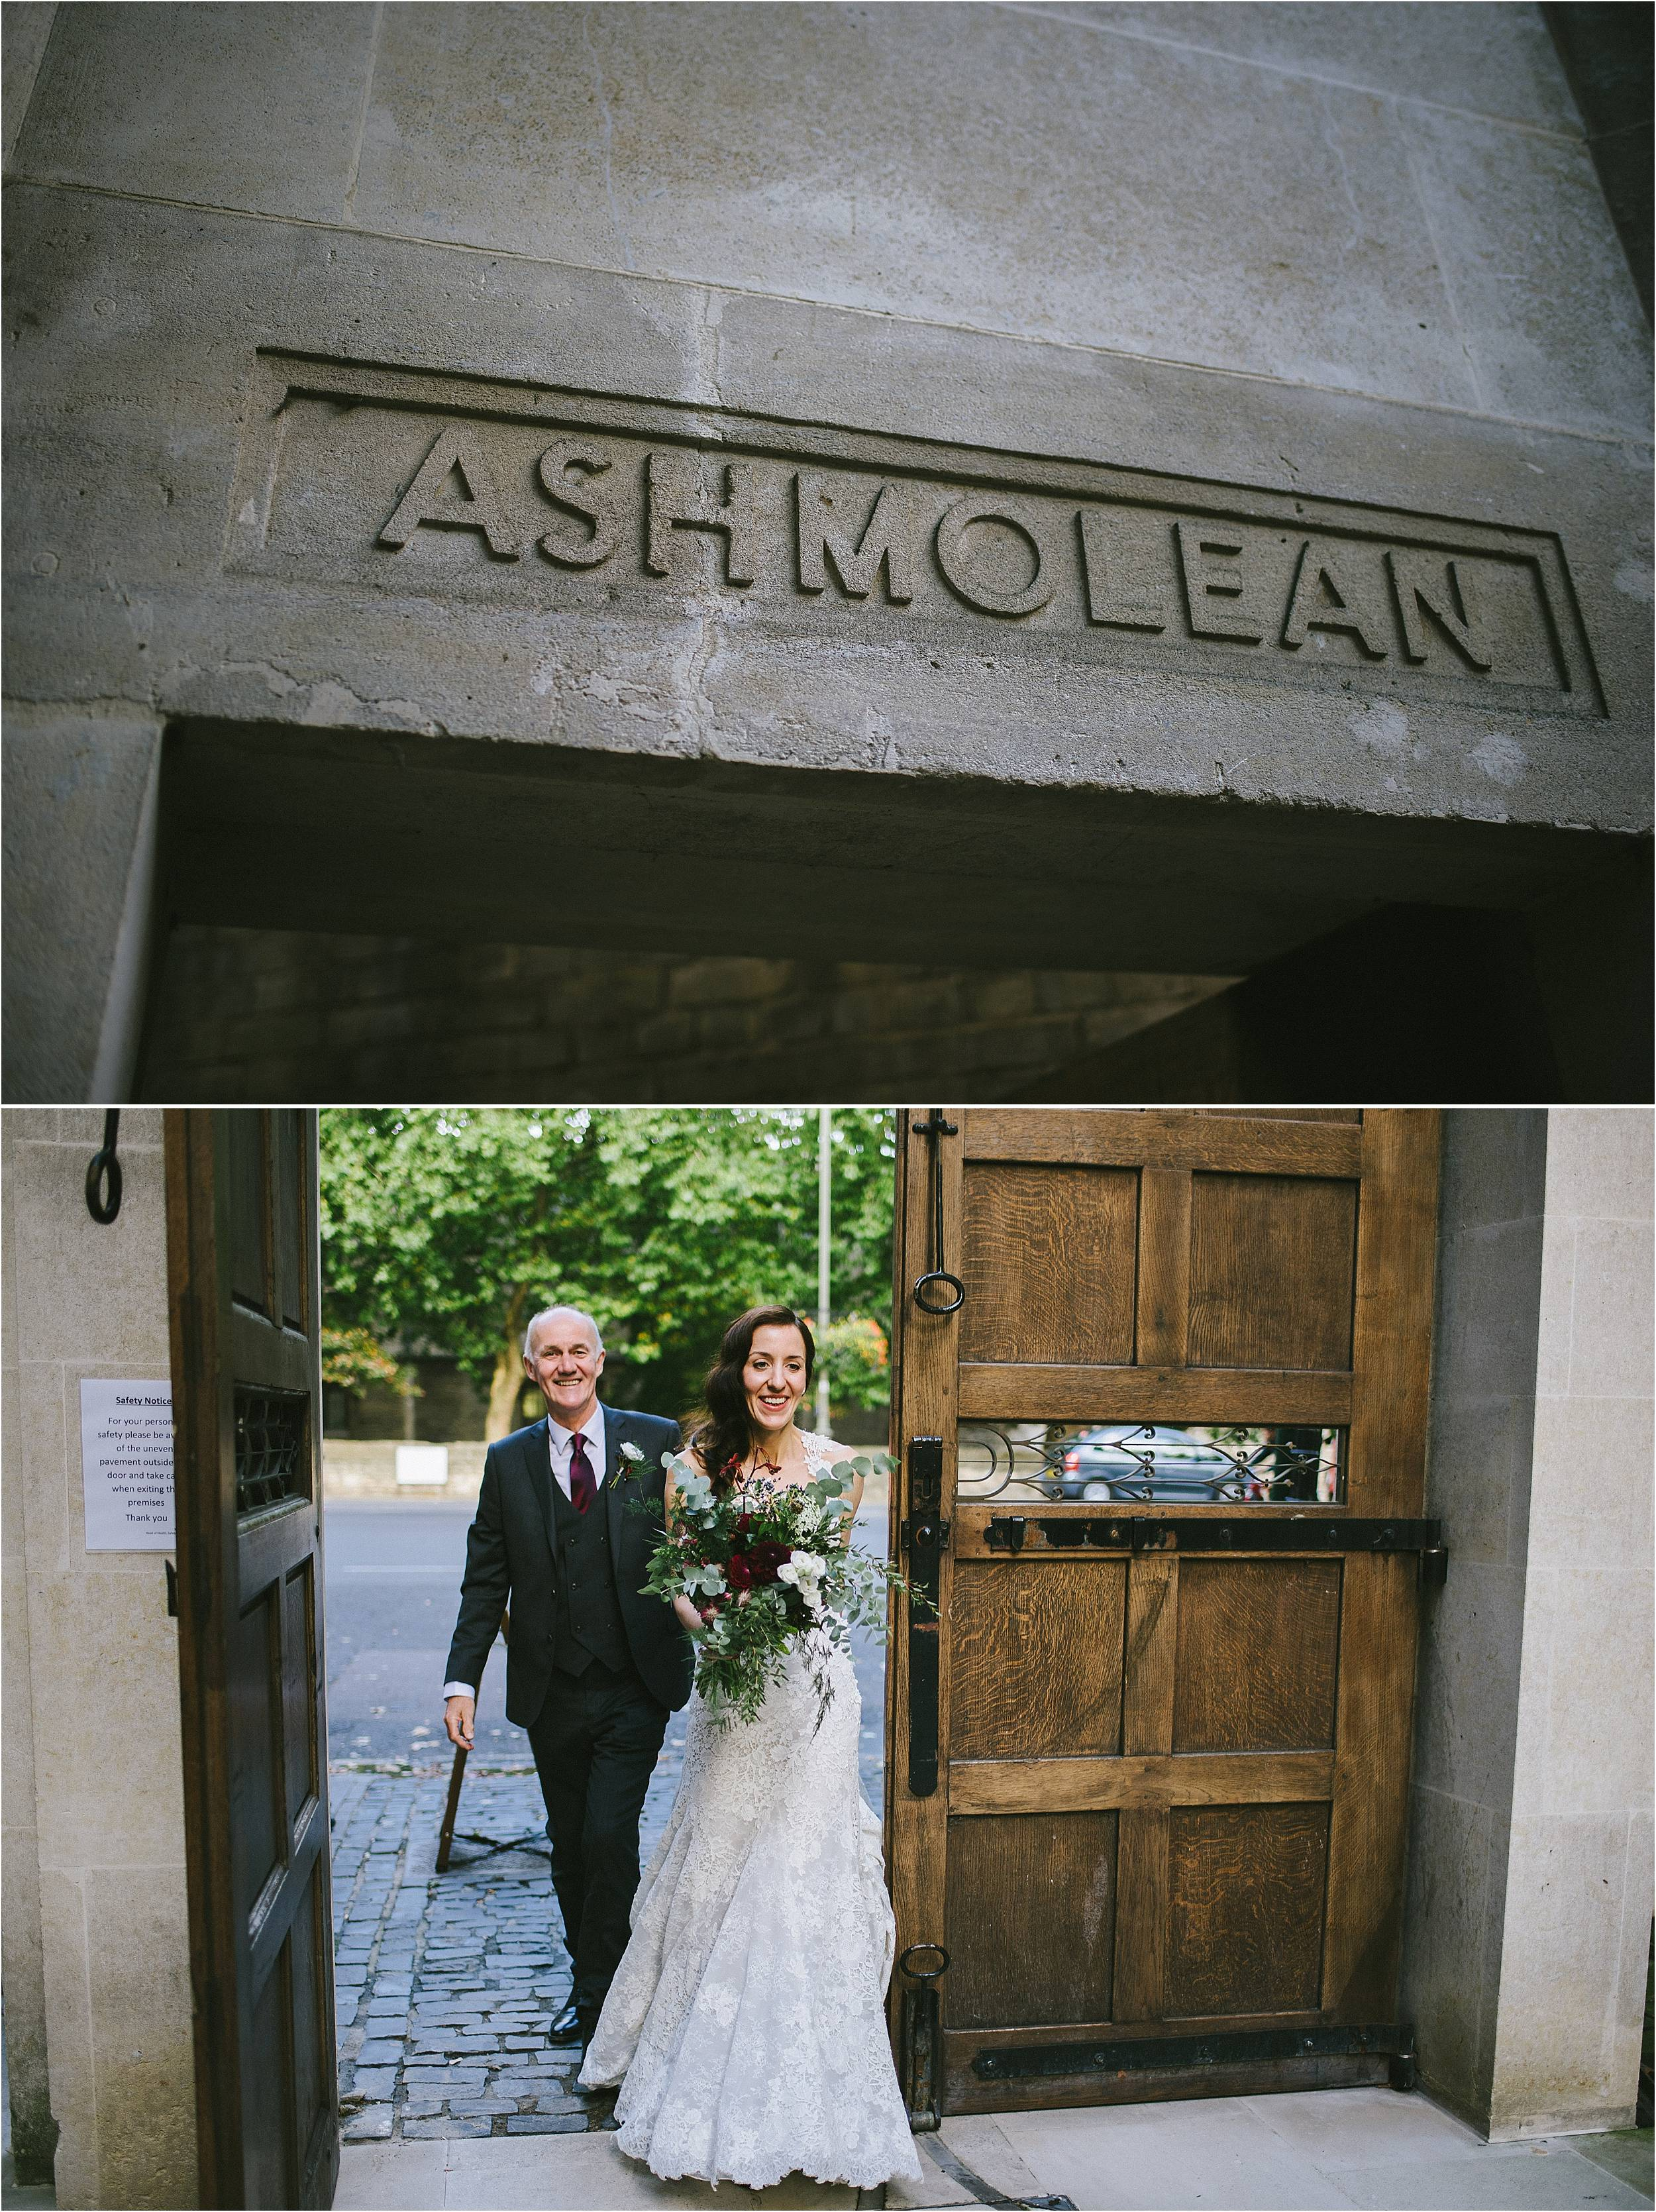 Oxford Ashmolean Museum Wedding Photography_0066.jpg